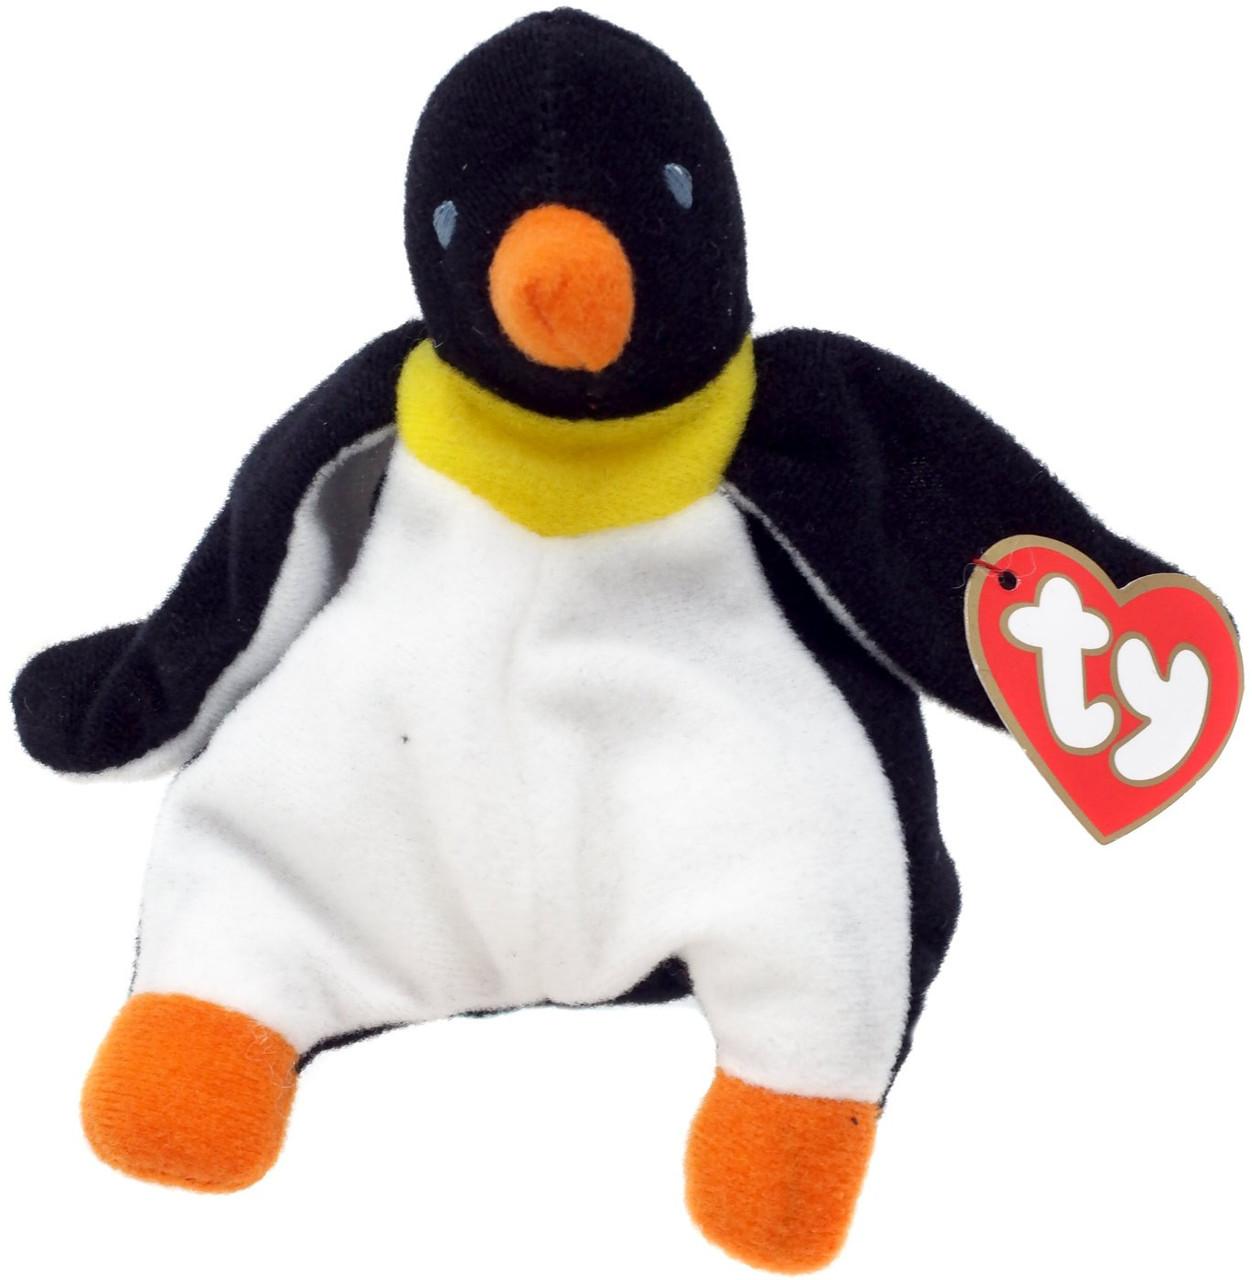 cfcfb0657d7 Beanie Babies McDonalds Waddle the Penguin Beanie Baby Plush 11 Ty - ToyWiz